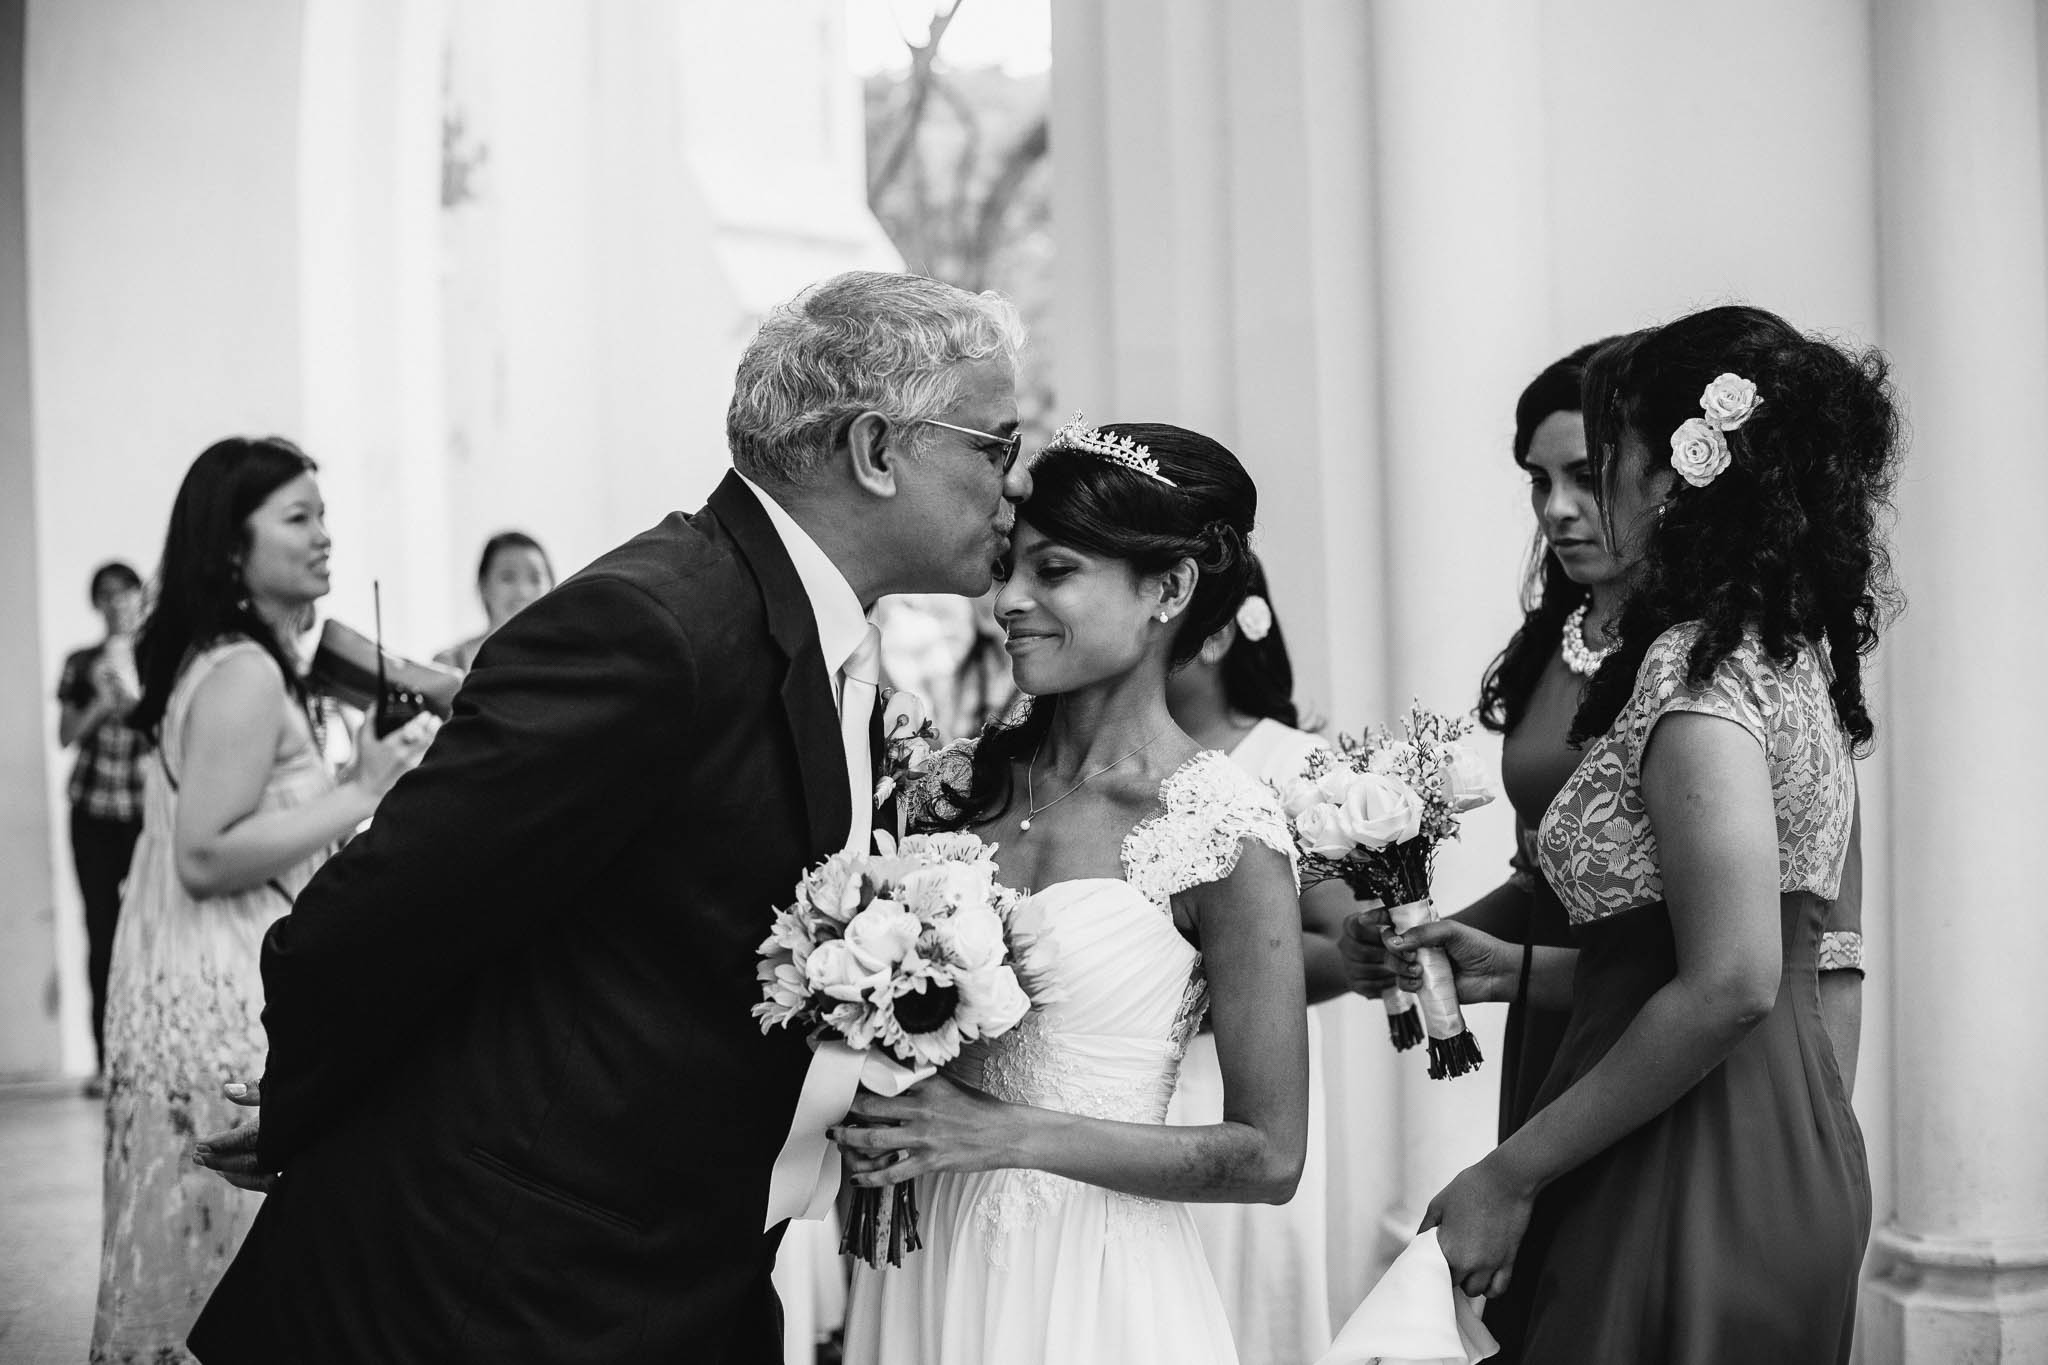 singapore-wedding-photographer-st-andrews-cathedral-renita-david-06.jpg